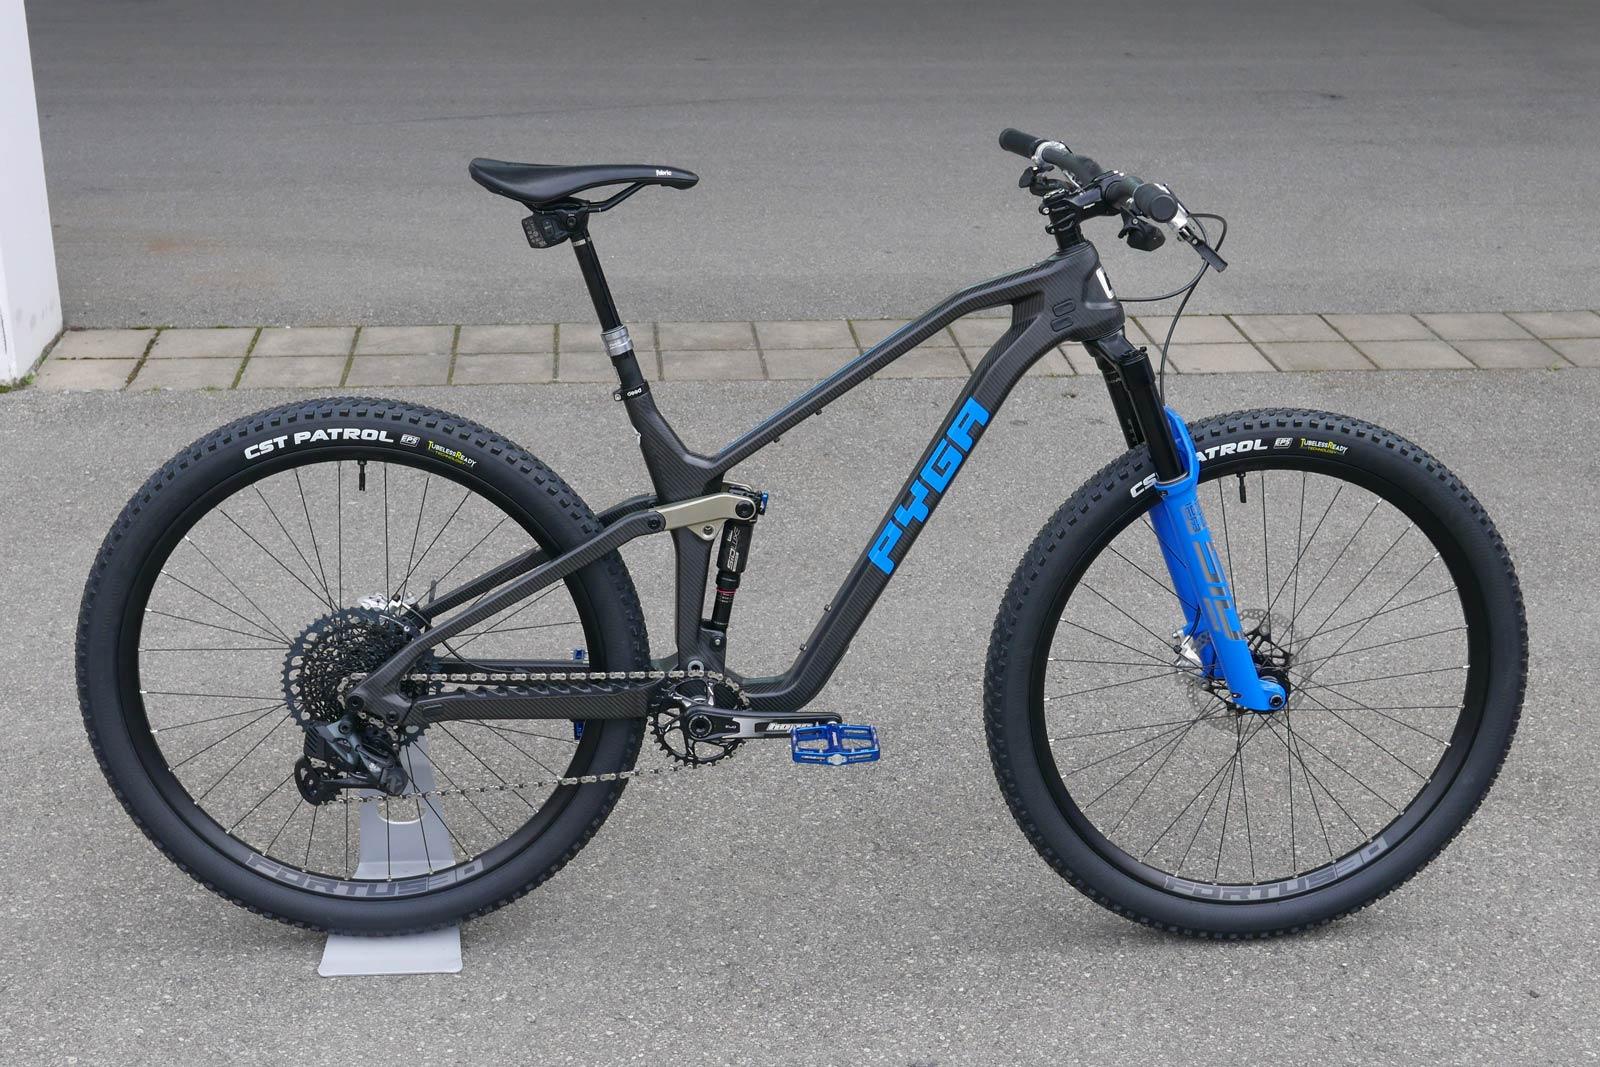 pyga mobu carbon full suspension mountain bike made in south africa